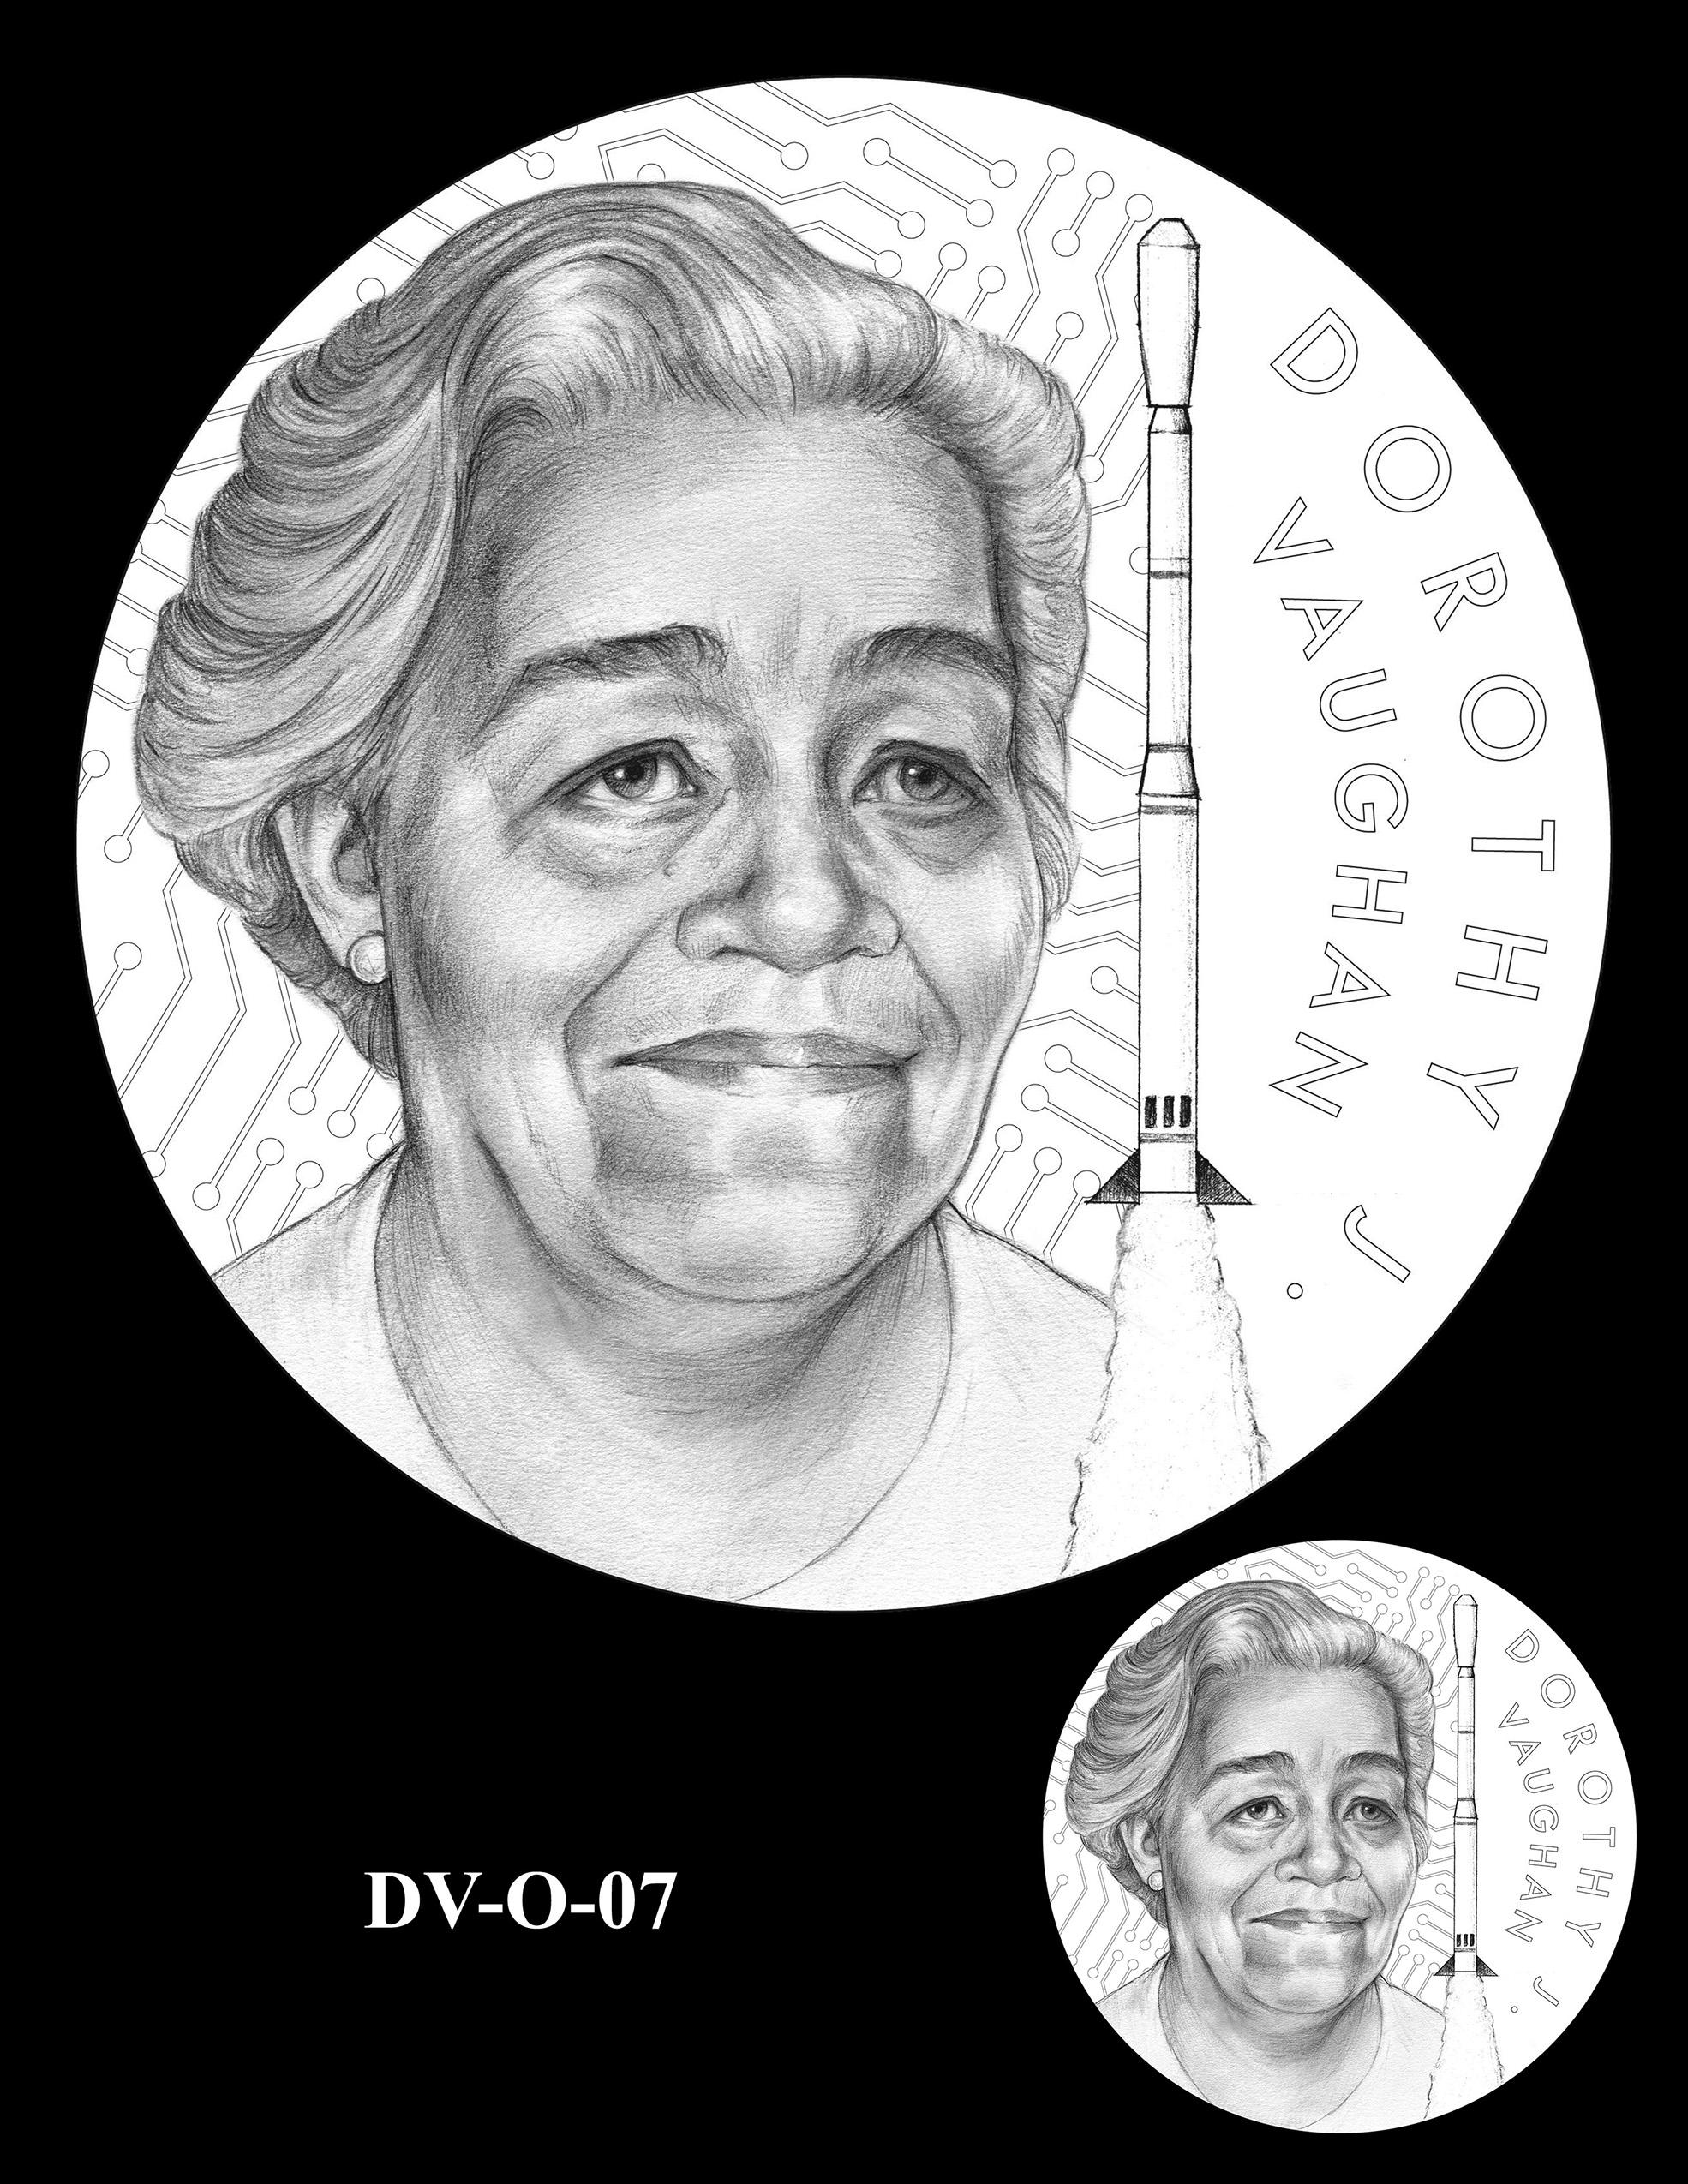 DV-O-07 -- Dorothy J. Vaughan Congressional Gold Medal